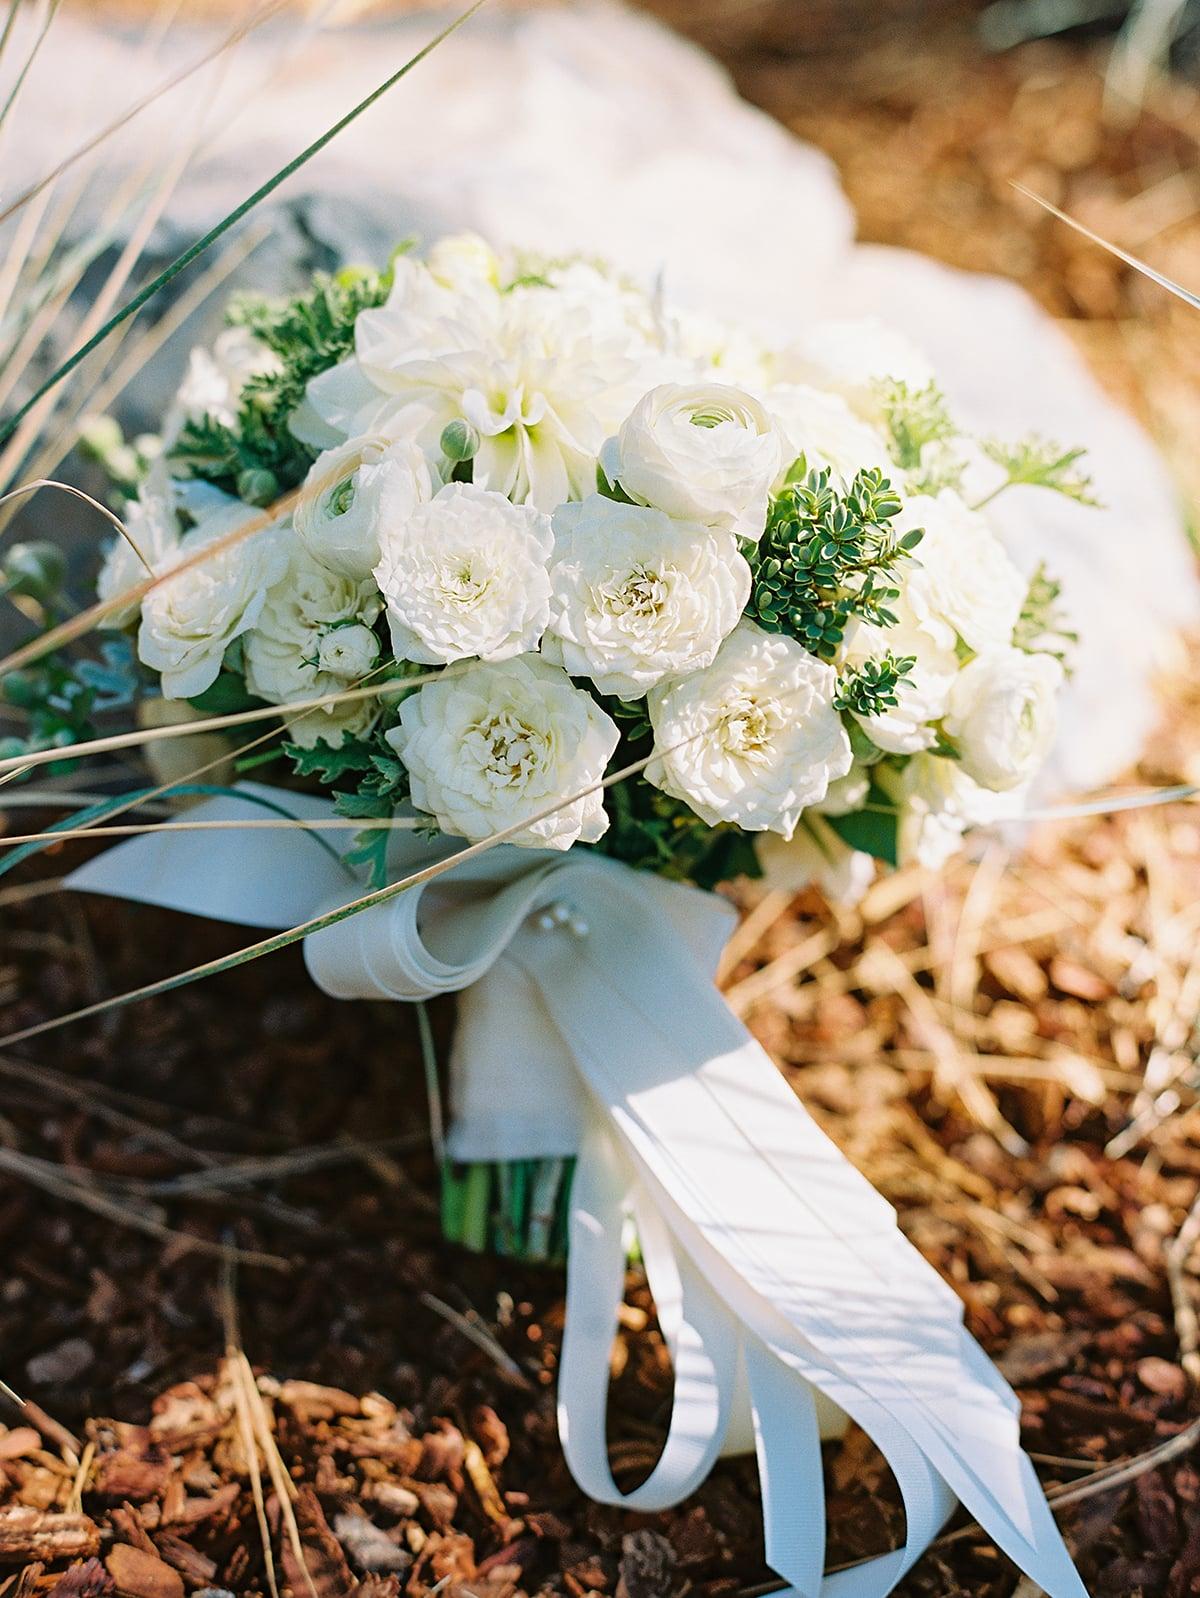 Heirloom Floral Design - Sisters Oregon - 2.jpg